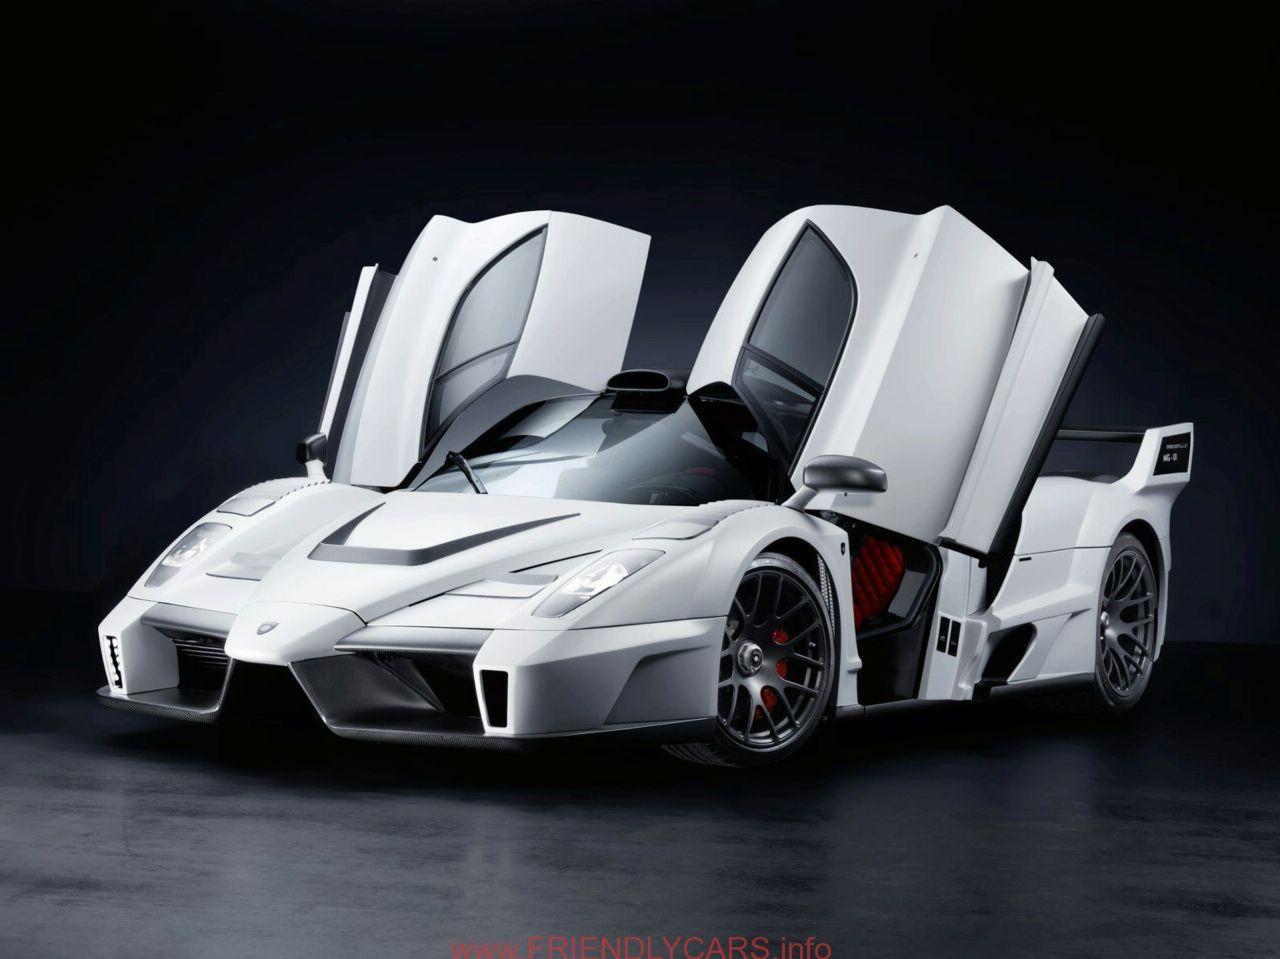 Cool Enzo Ferrari Car Black Car Images Hd White Ferrari Enzo